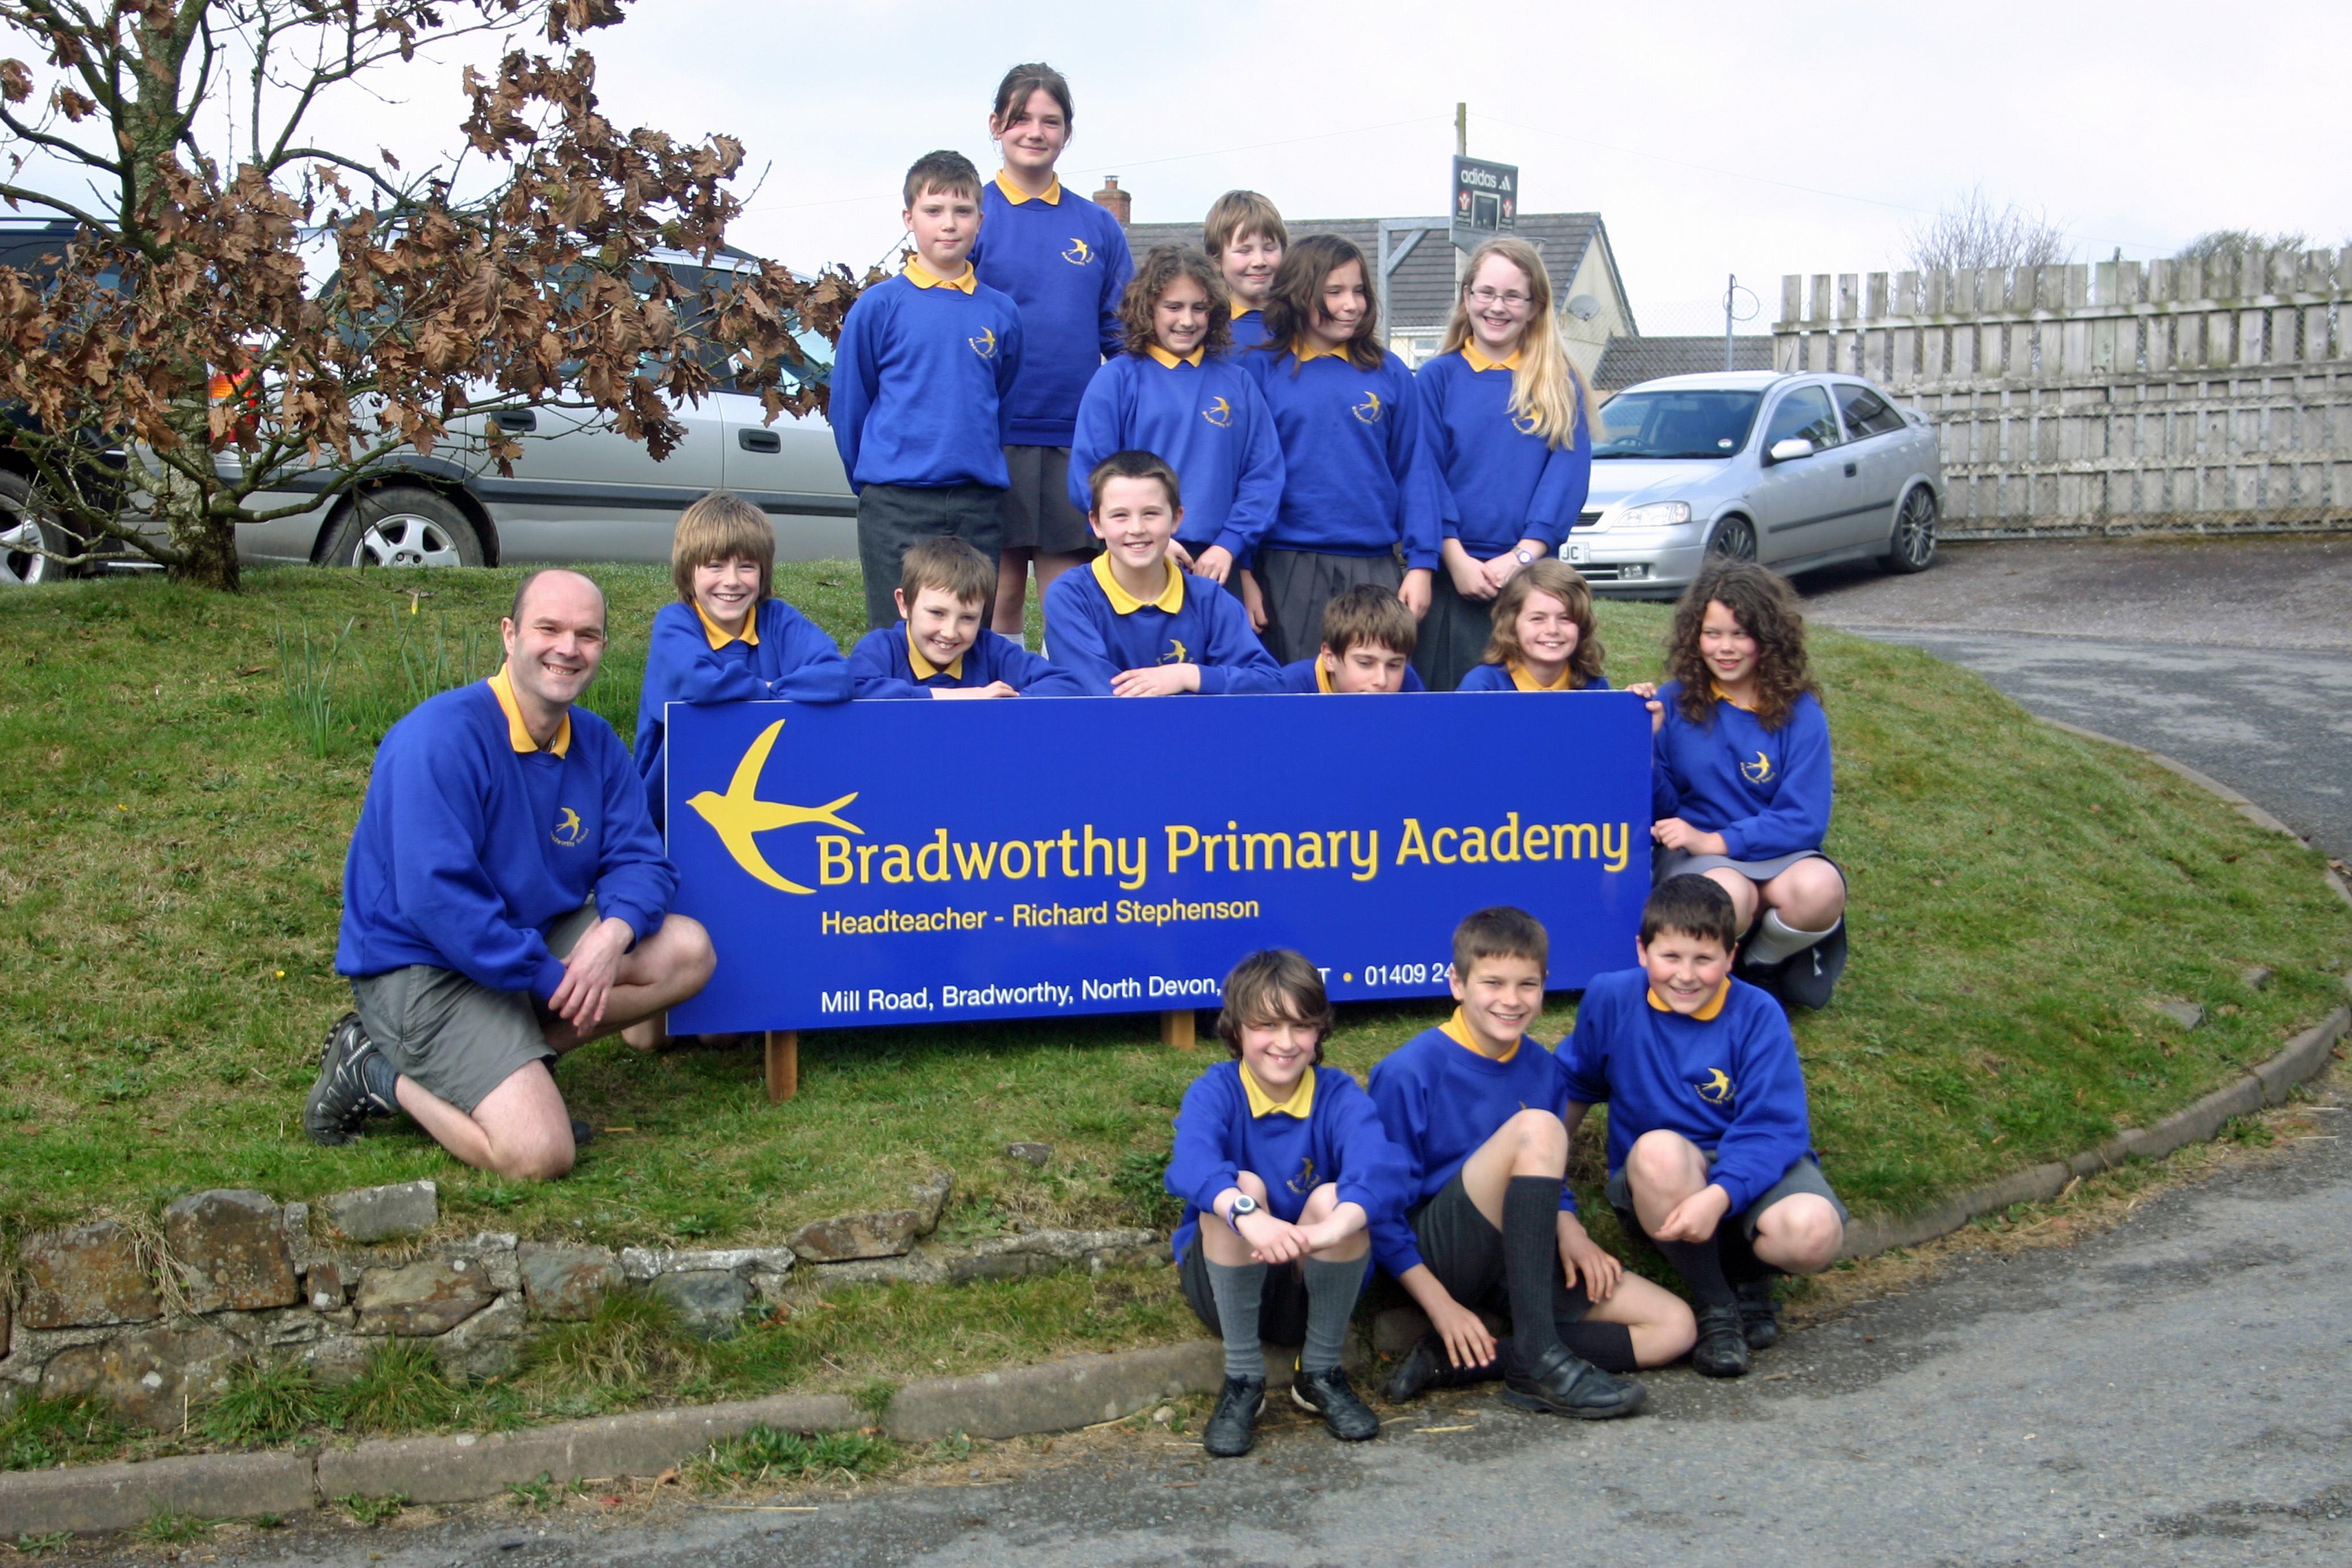 Students from Bradworth Academy with headteacher Richard Stephenson.